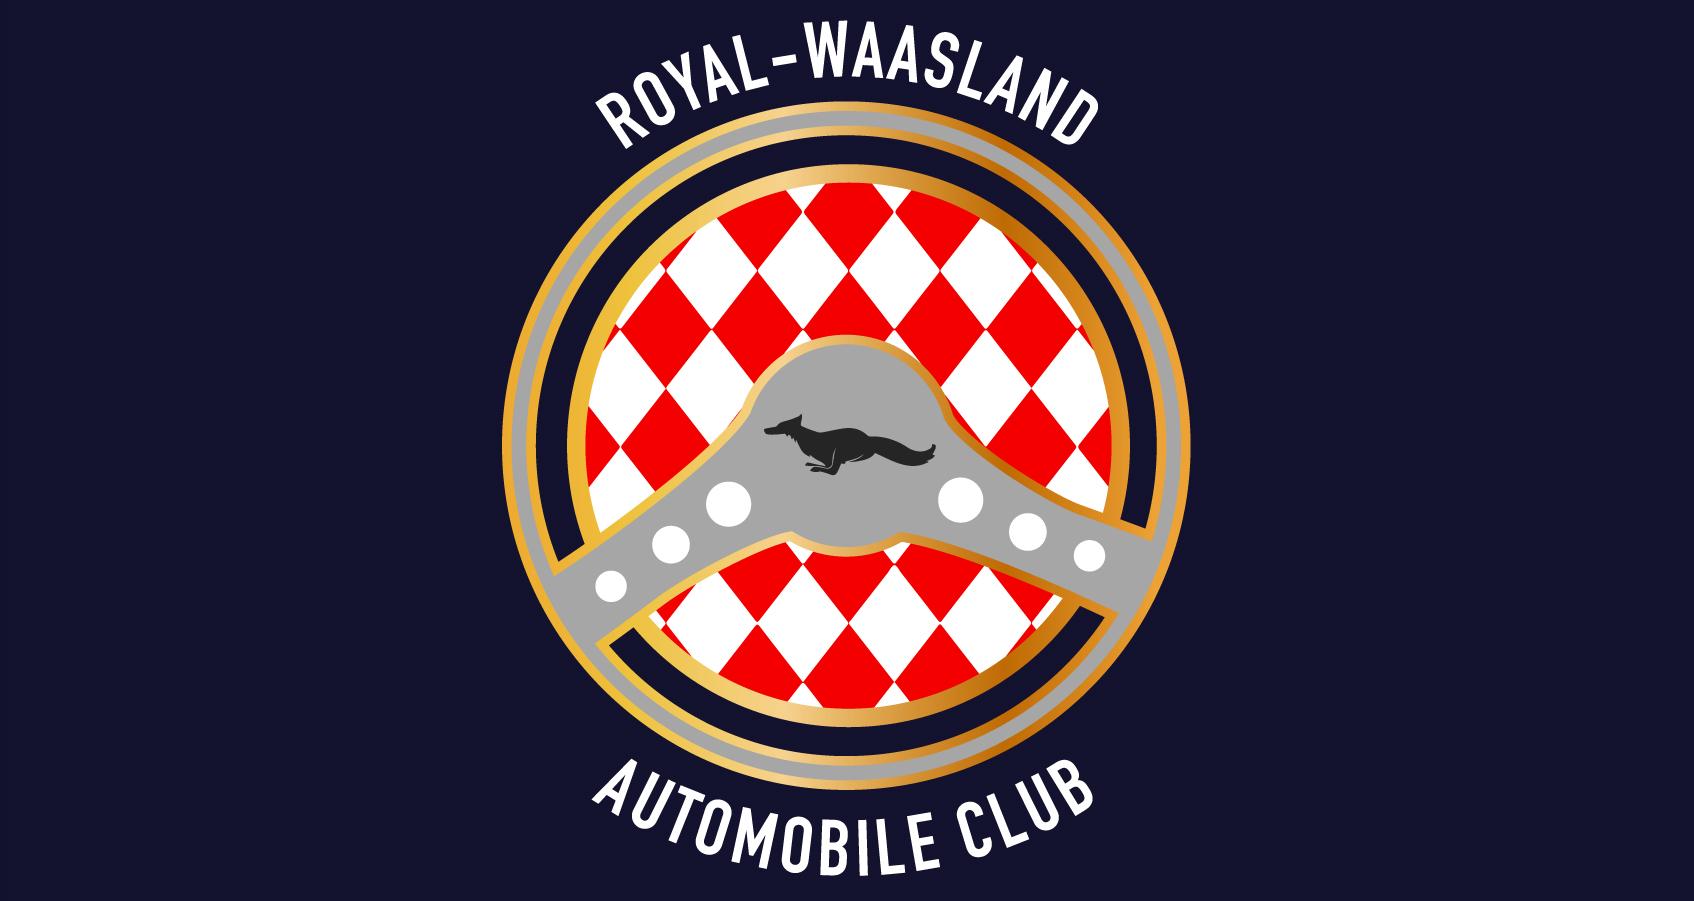 Royal-Waasland Automobile Club